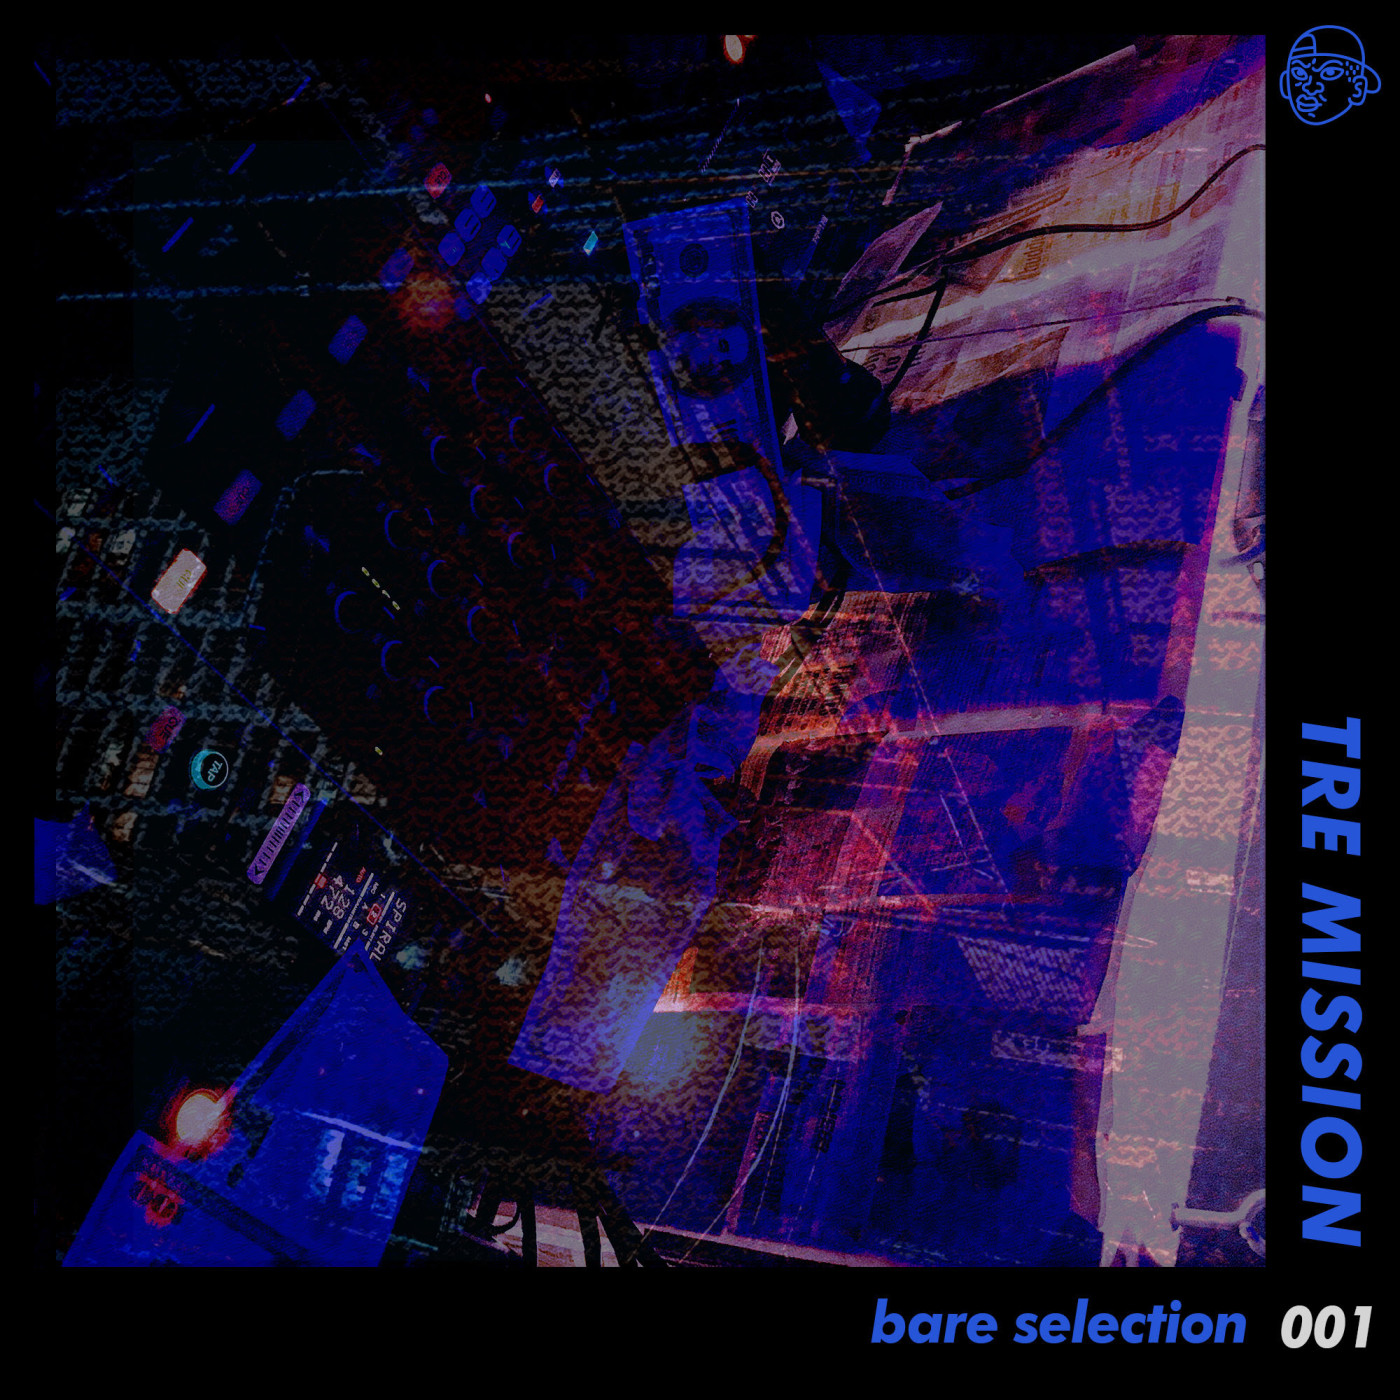 bare-selection-001